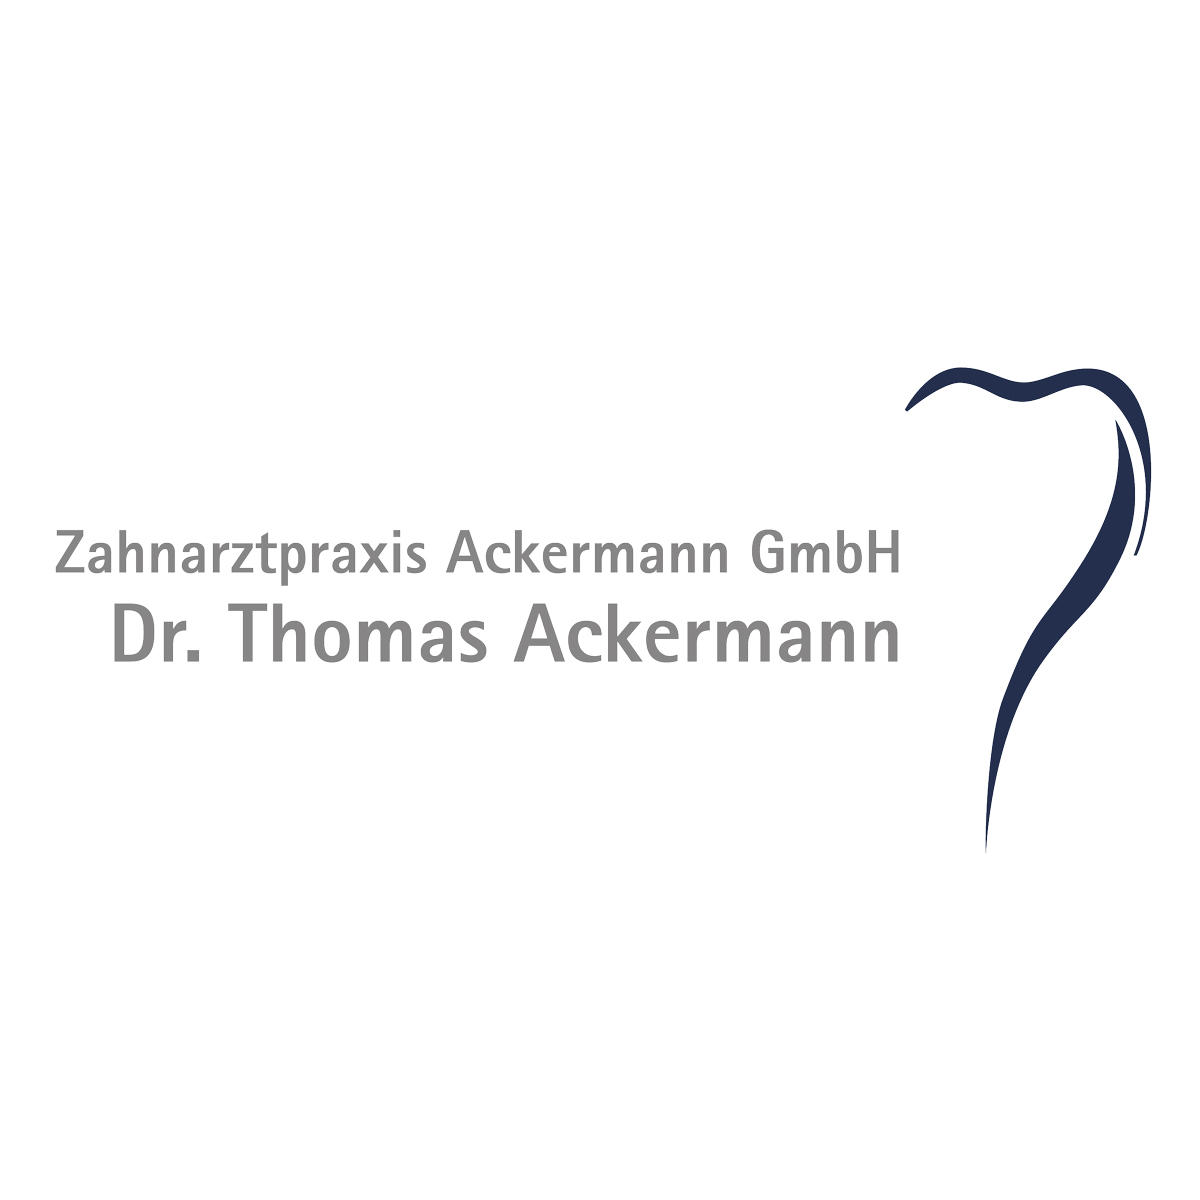 Dr. Thomas Ackermann Zahnarztpraxis